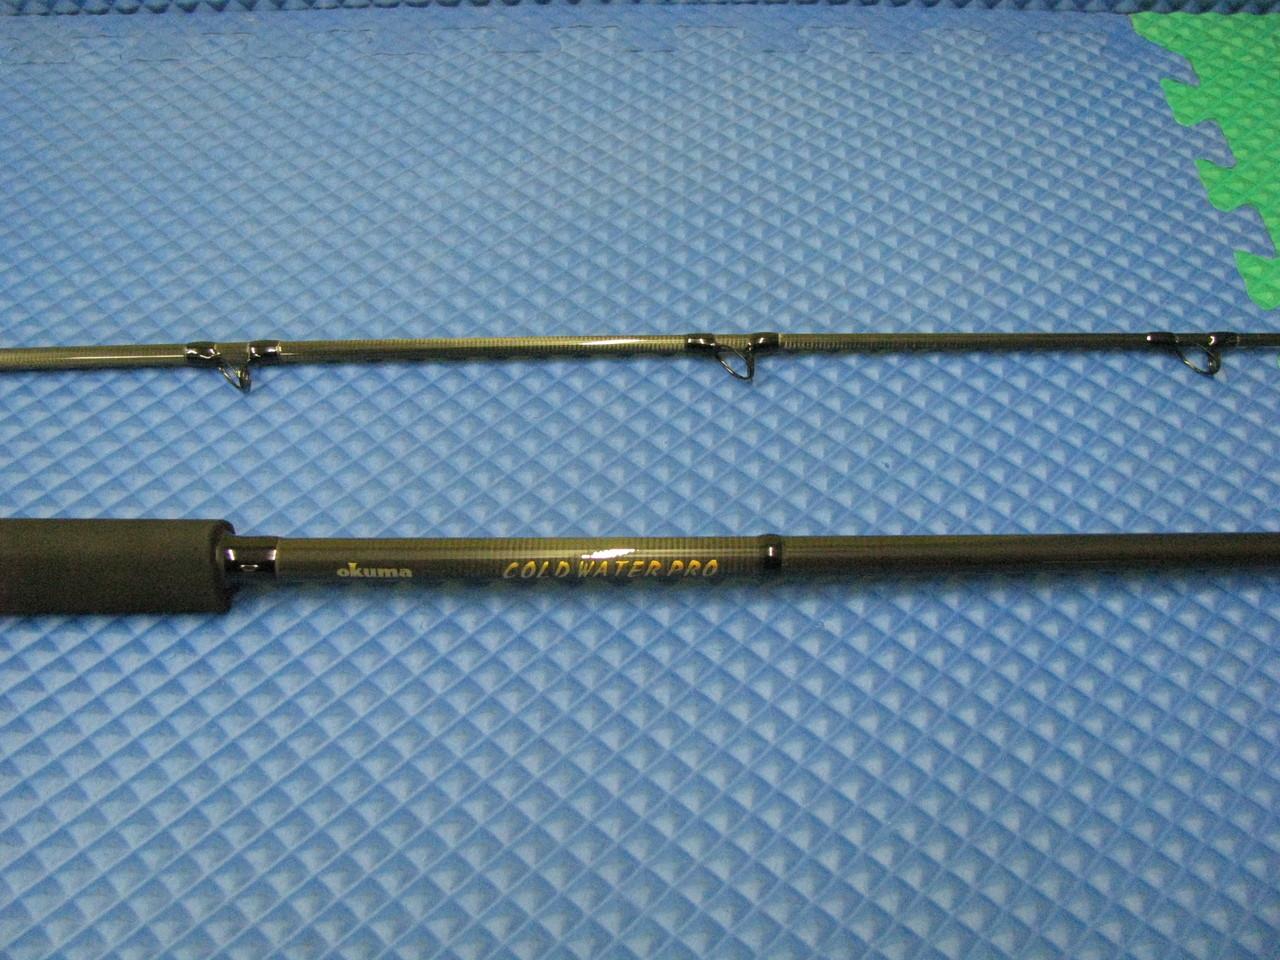 Okuma Coldwater Pro Trolling rod 9'